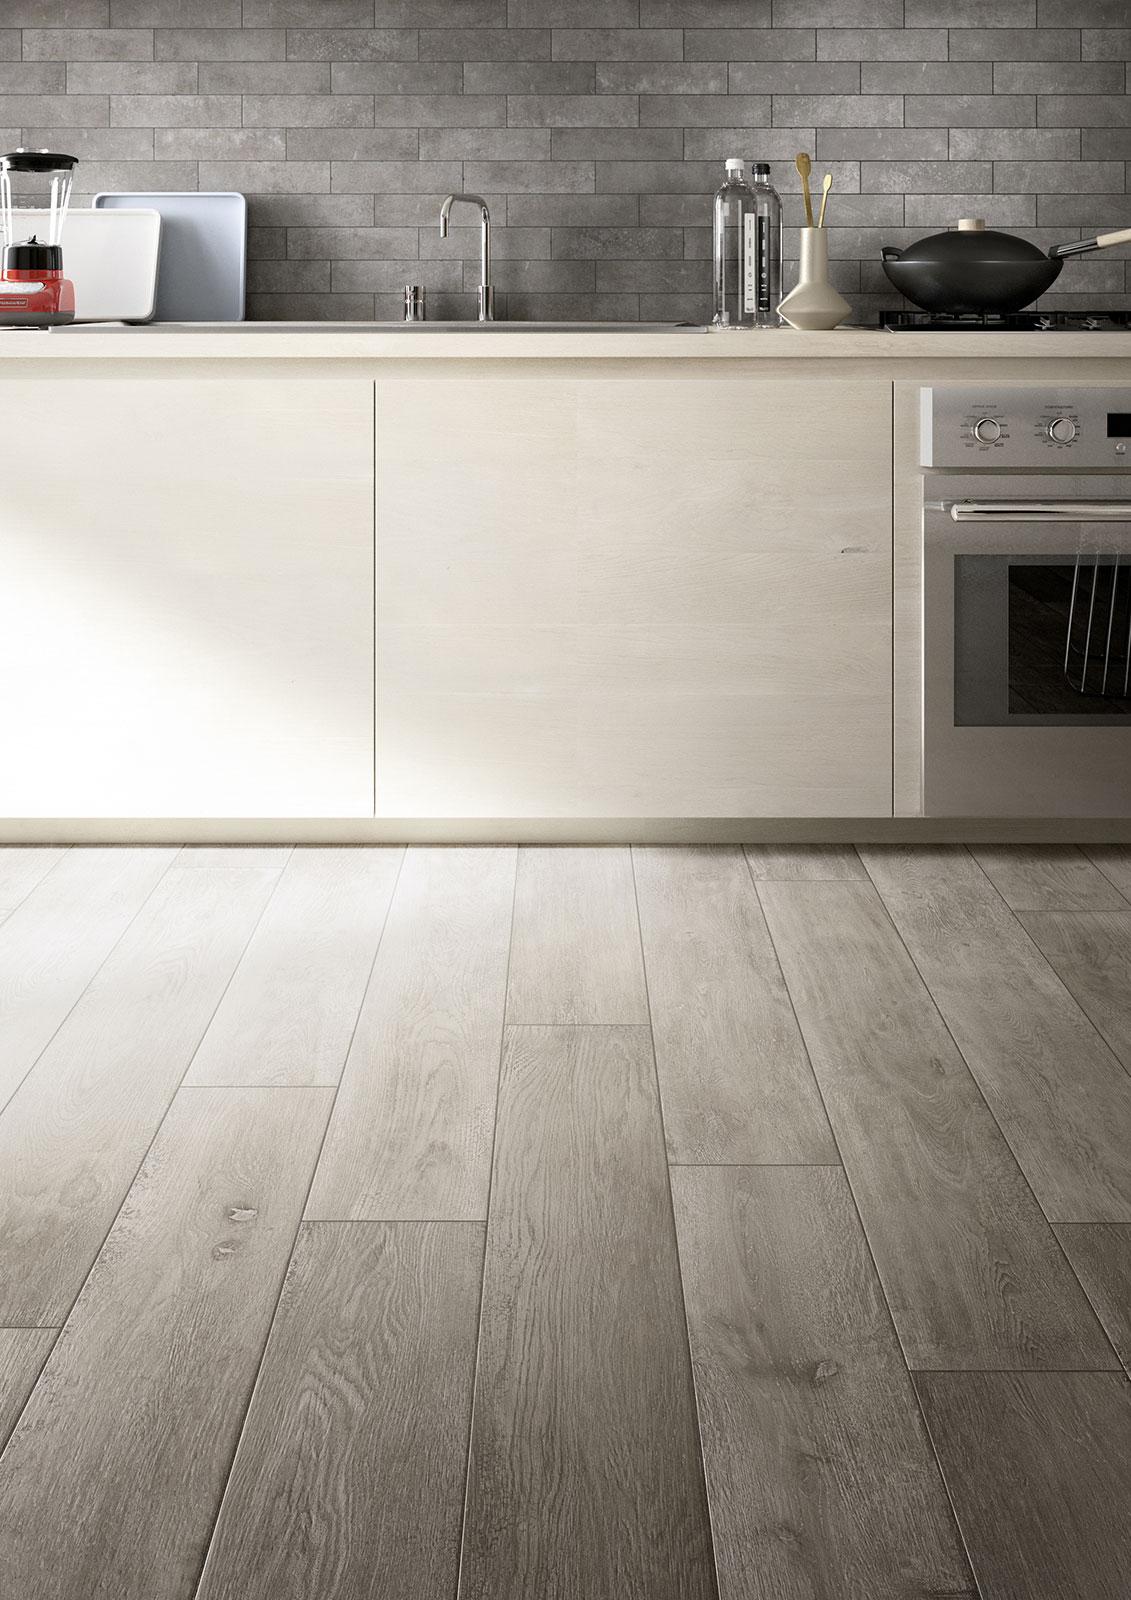 Fliesen In Der Farbe Grau: Unsere Kollektionen   Marazzi 6536